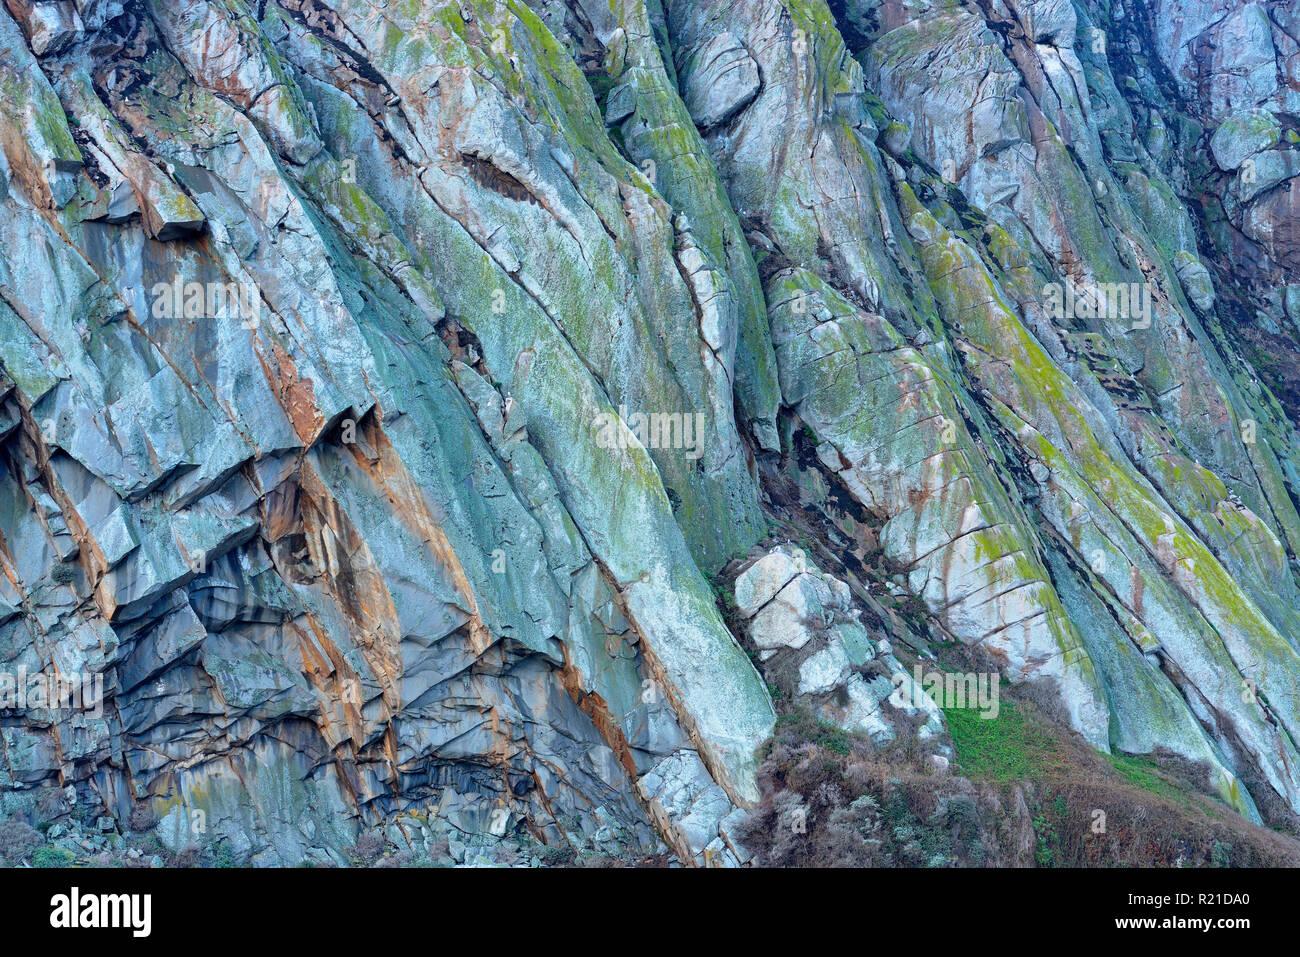 Morro Rock, Morro Bay, California, USA - Stock Image